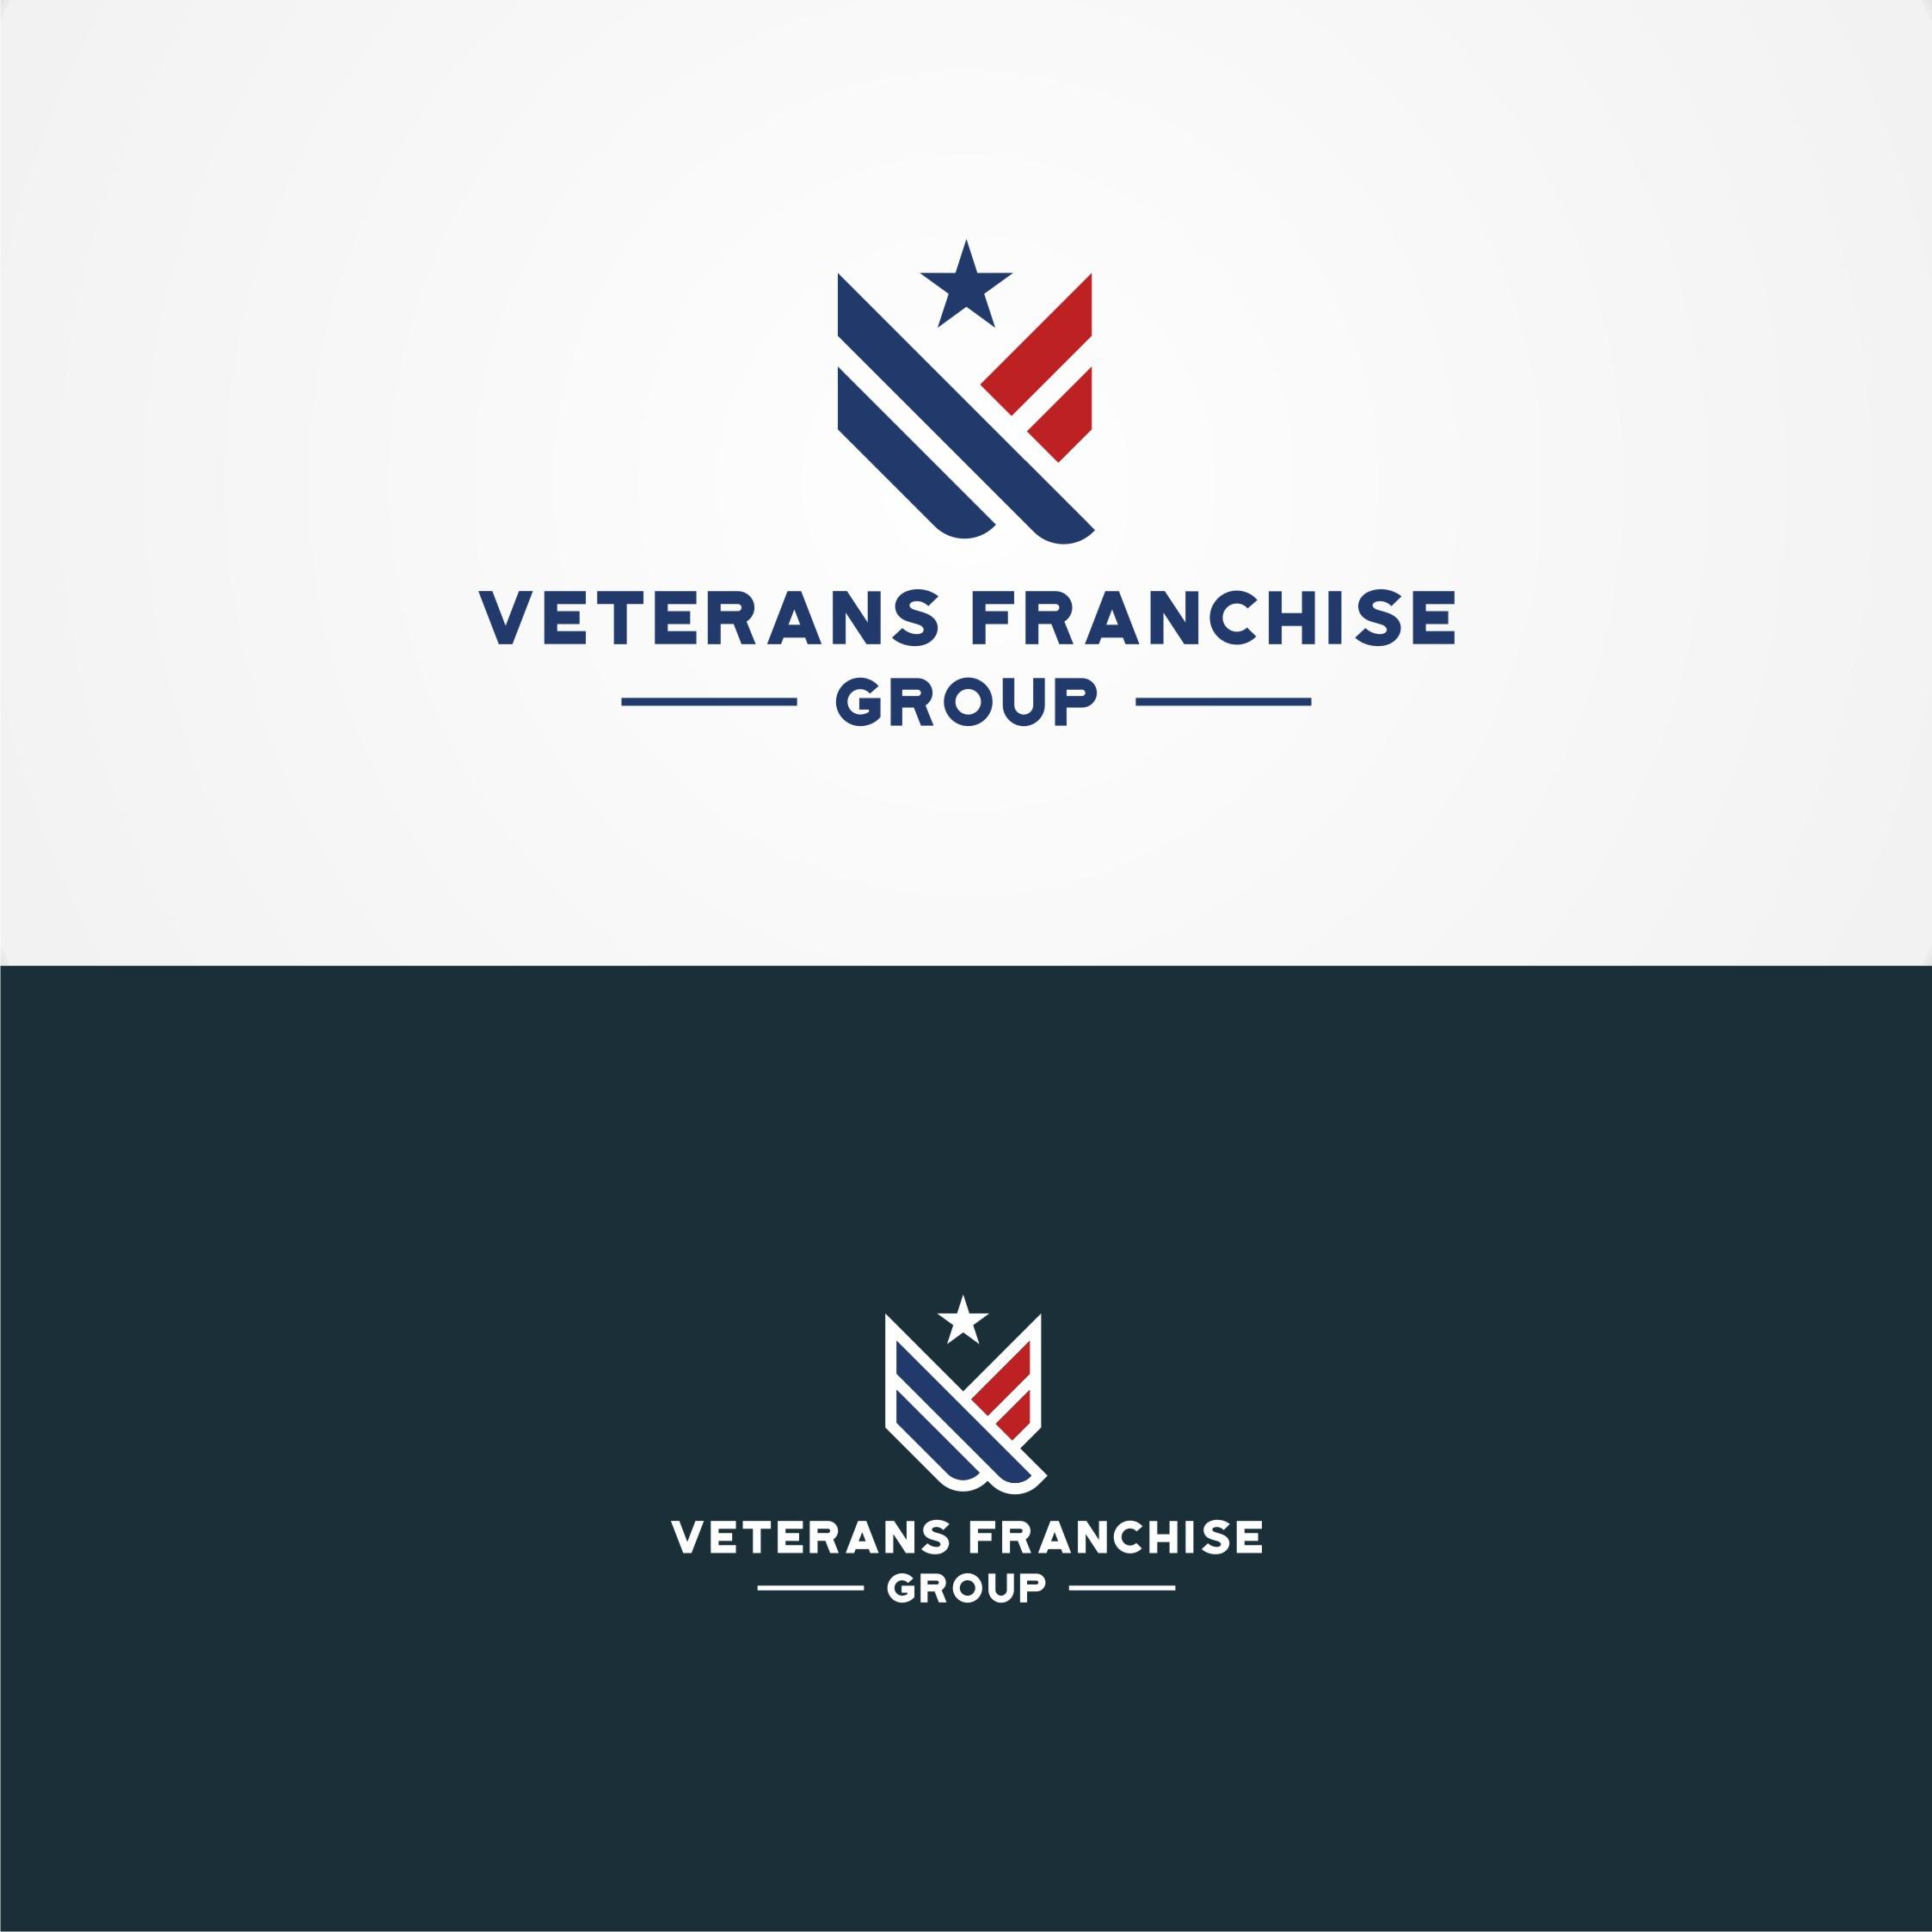 Military veteran business needs a patriotic, clean but fresh logo